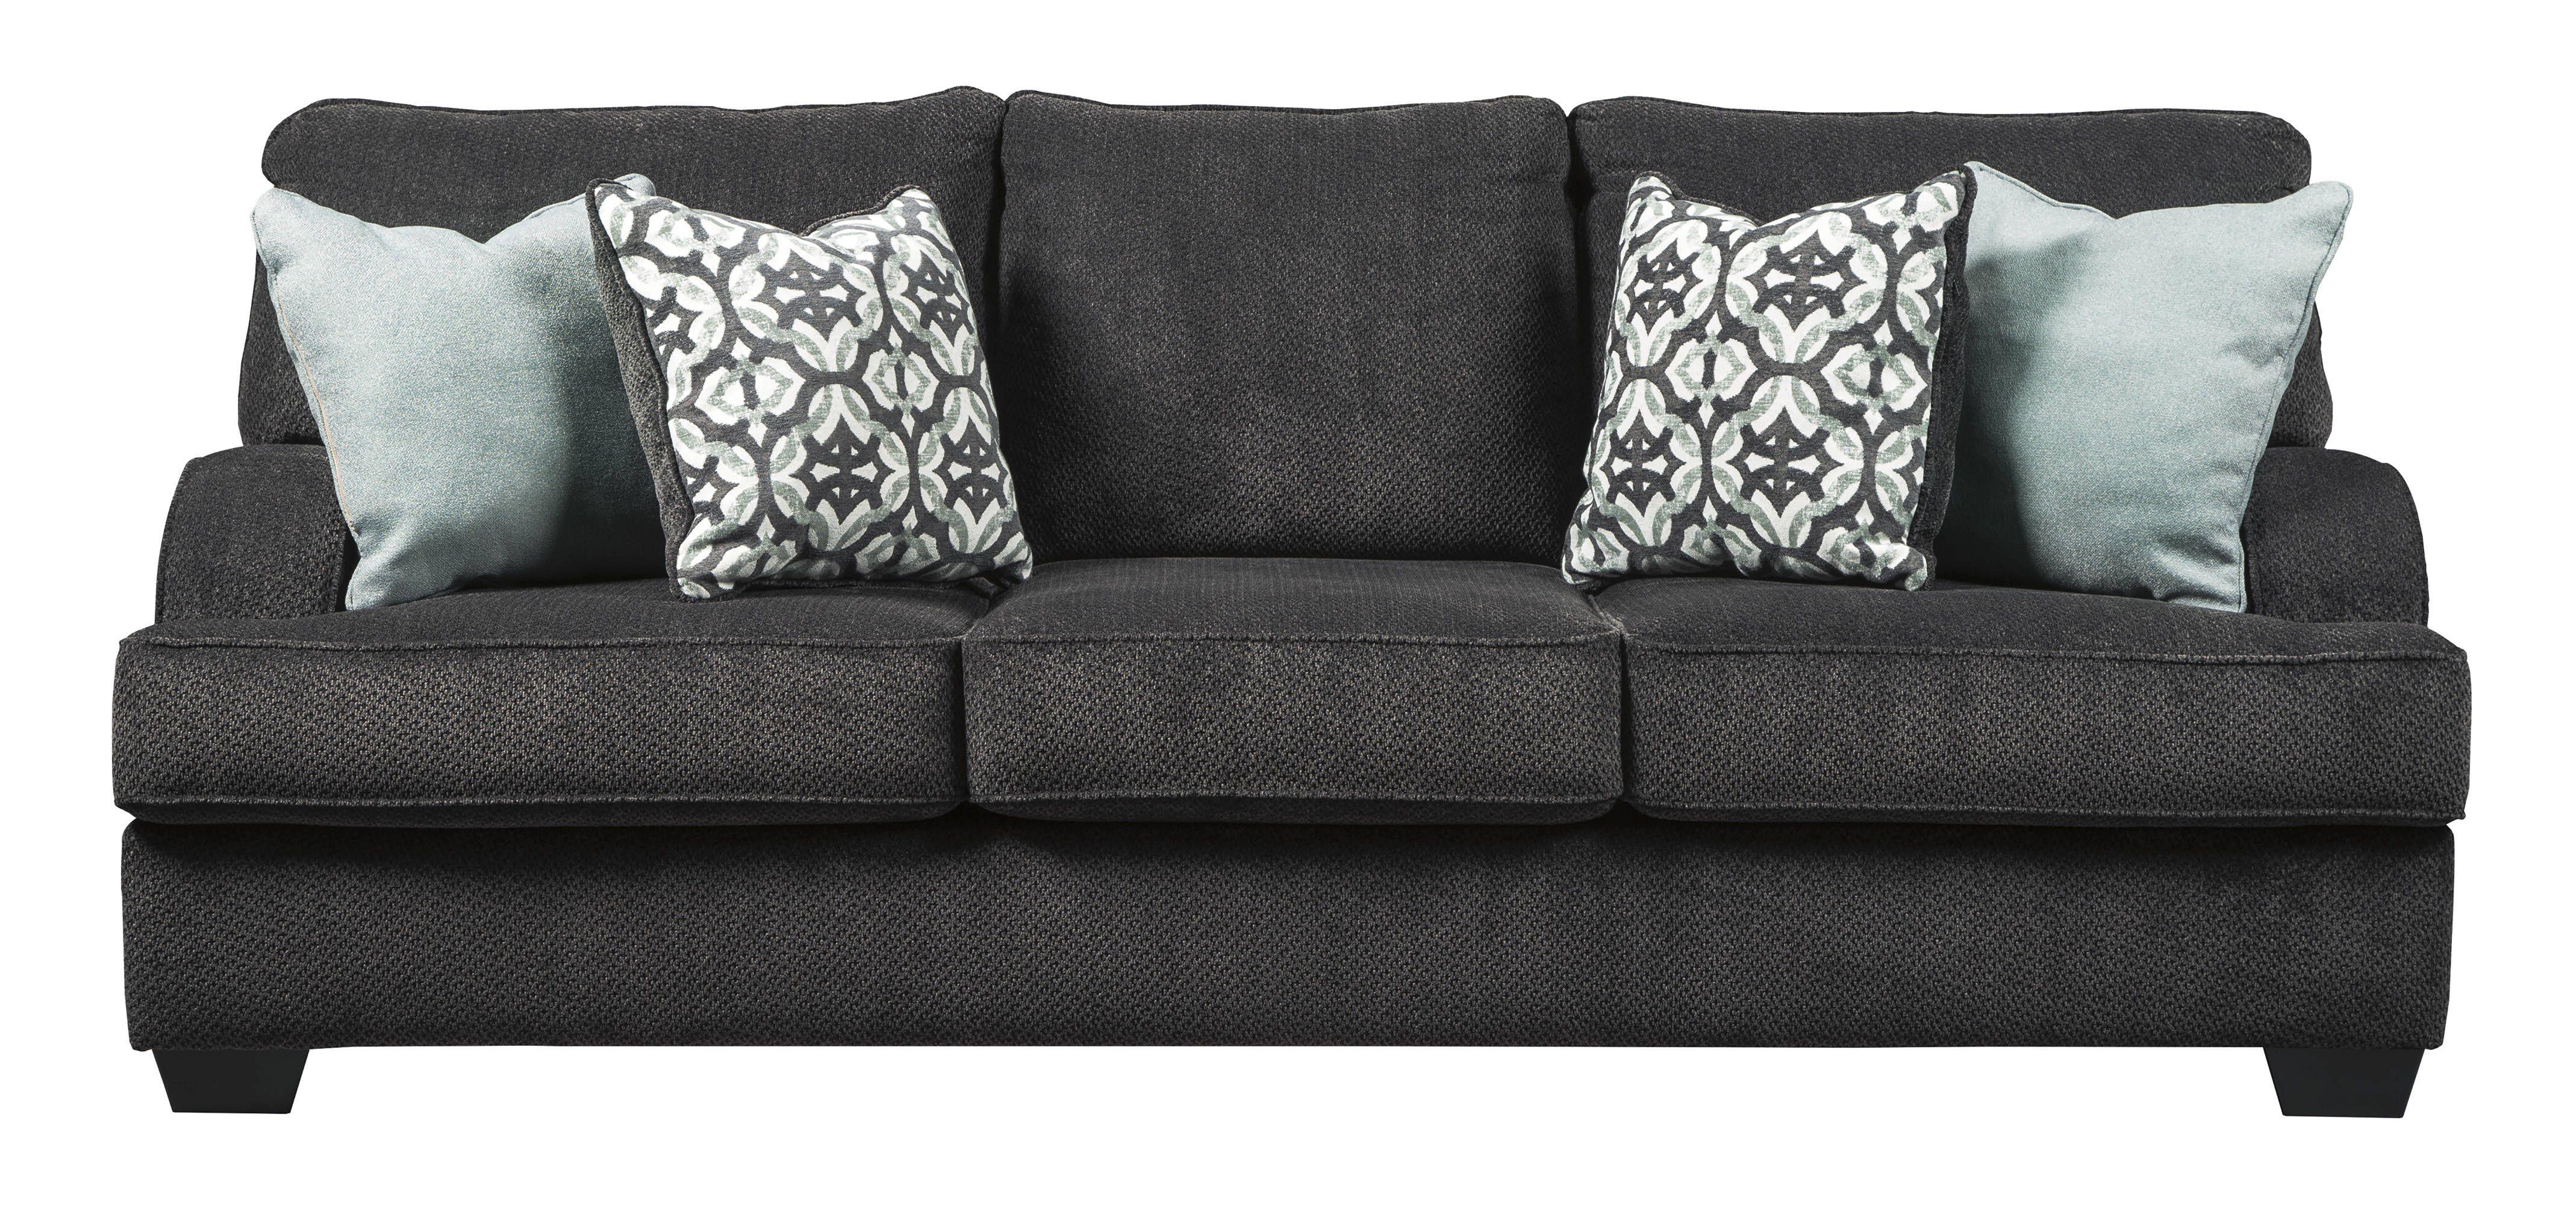 Best Lyonsgate Furniture Charcoal Sofa Ashley Furniture Sofa 400 x 300